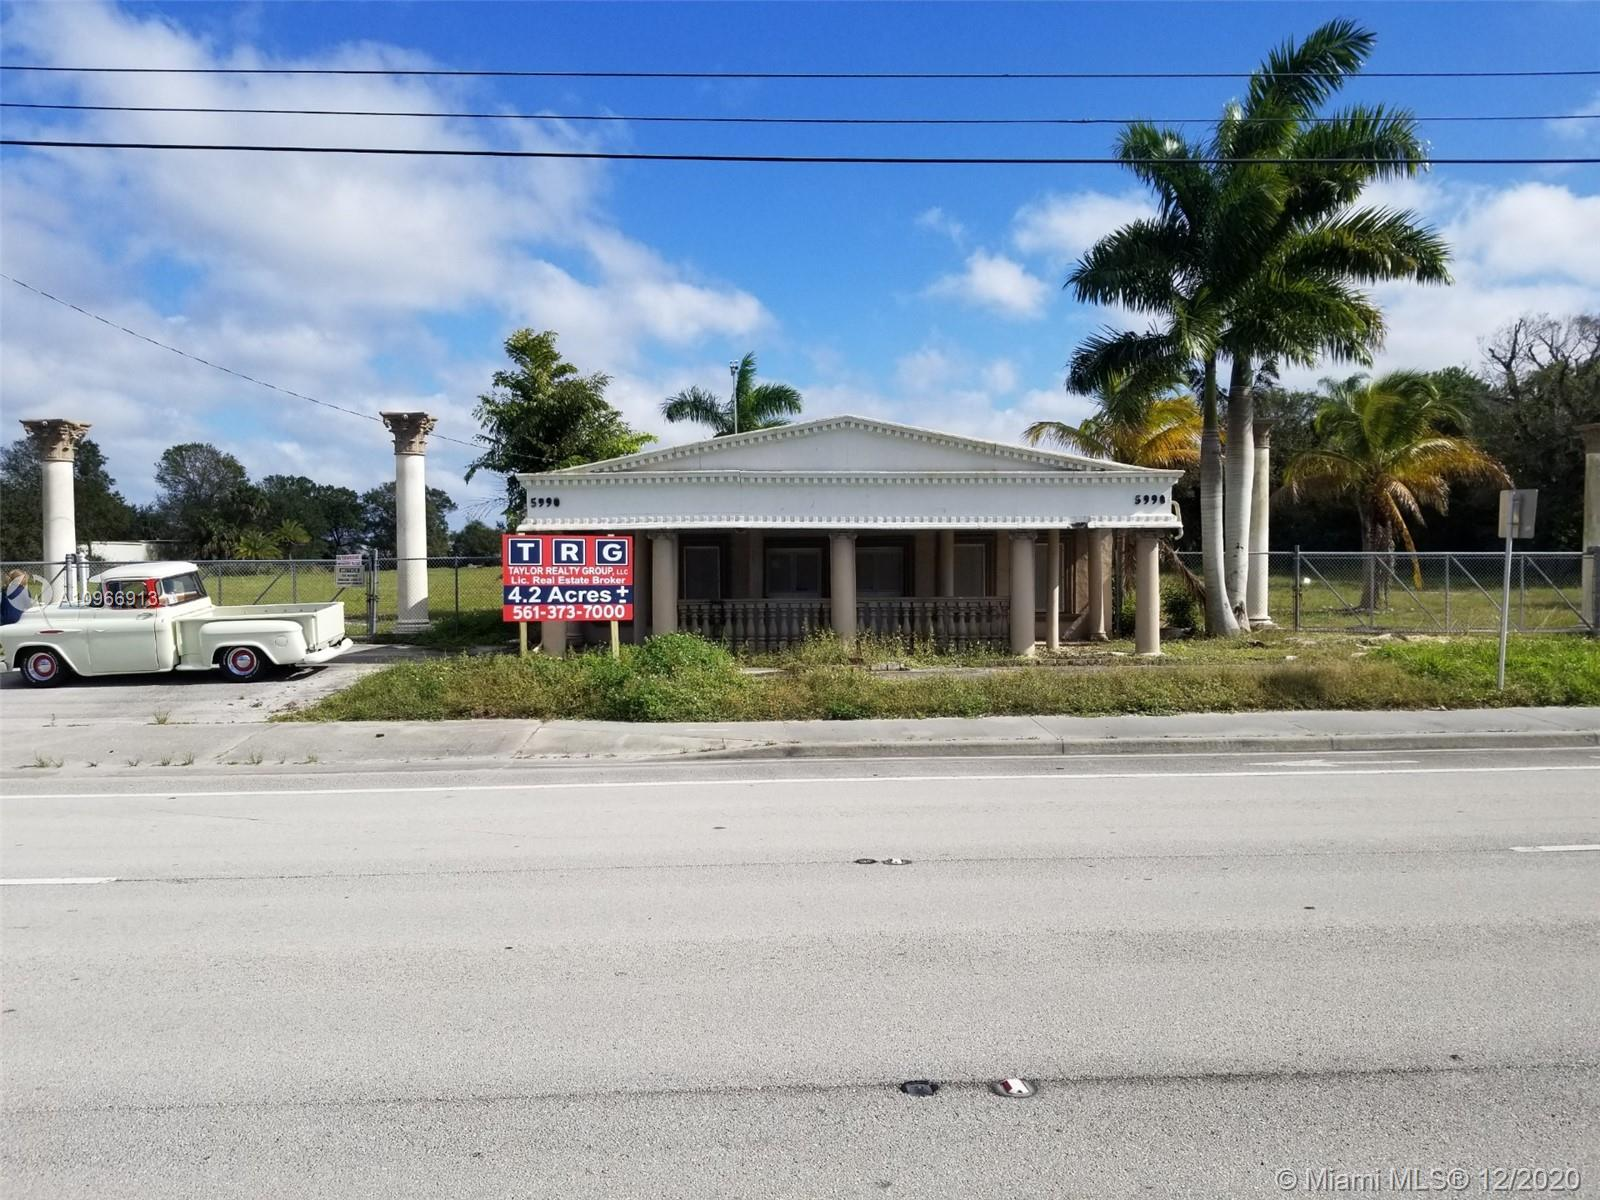 Photo of 5990 S Us Highway 1, Fort Pierce, FL 34982